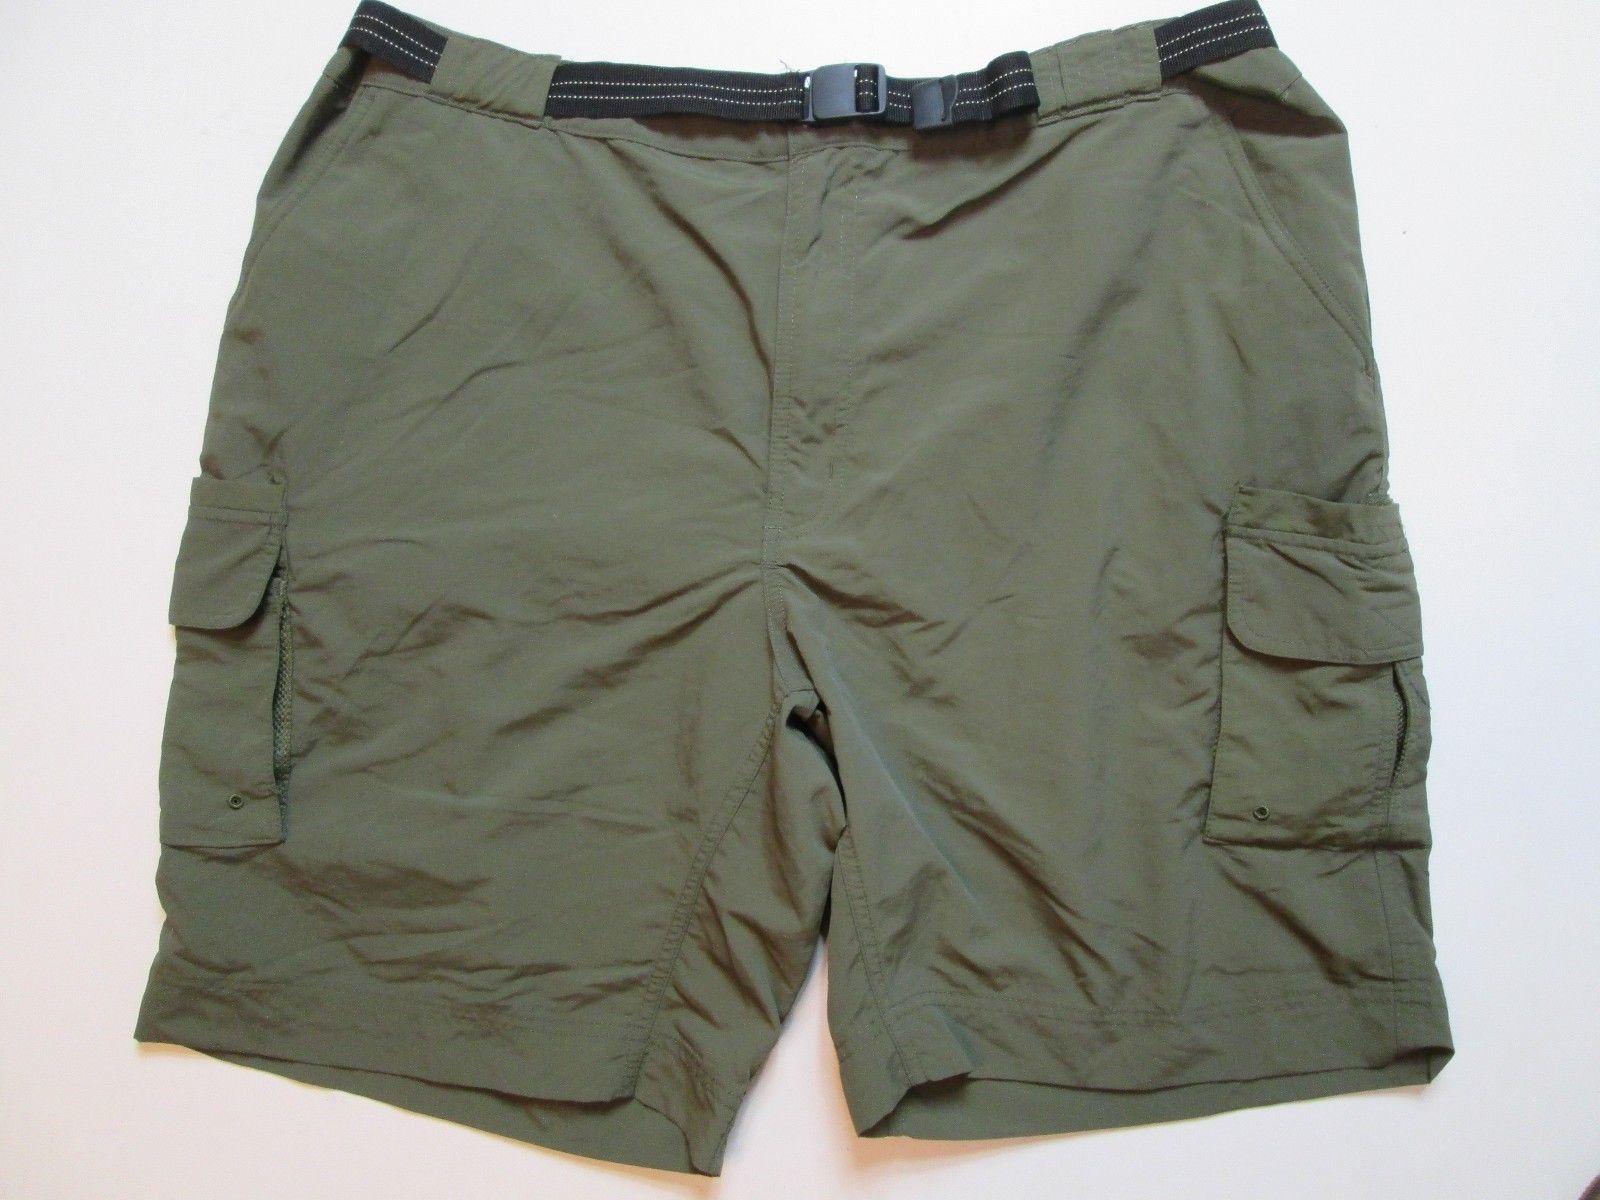 1ba3a1cb6a Magellan Outdoors Men's Fishing Cargo Shorts and 32 similar items. S l1600